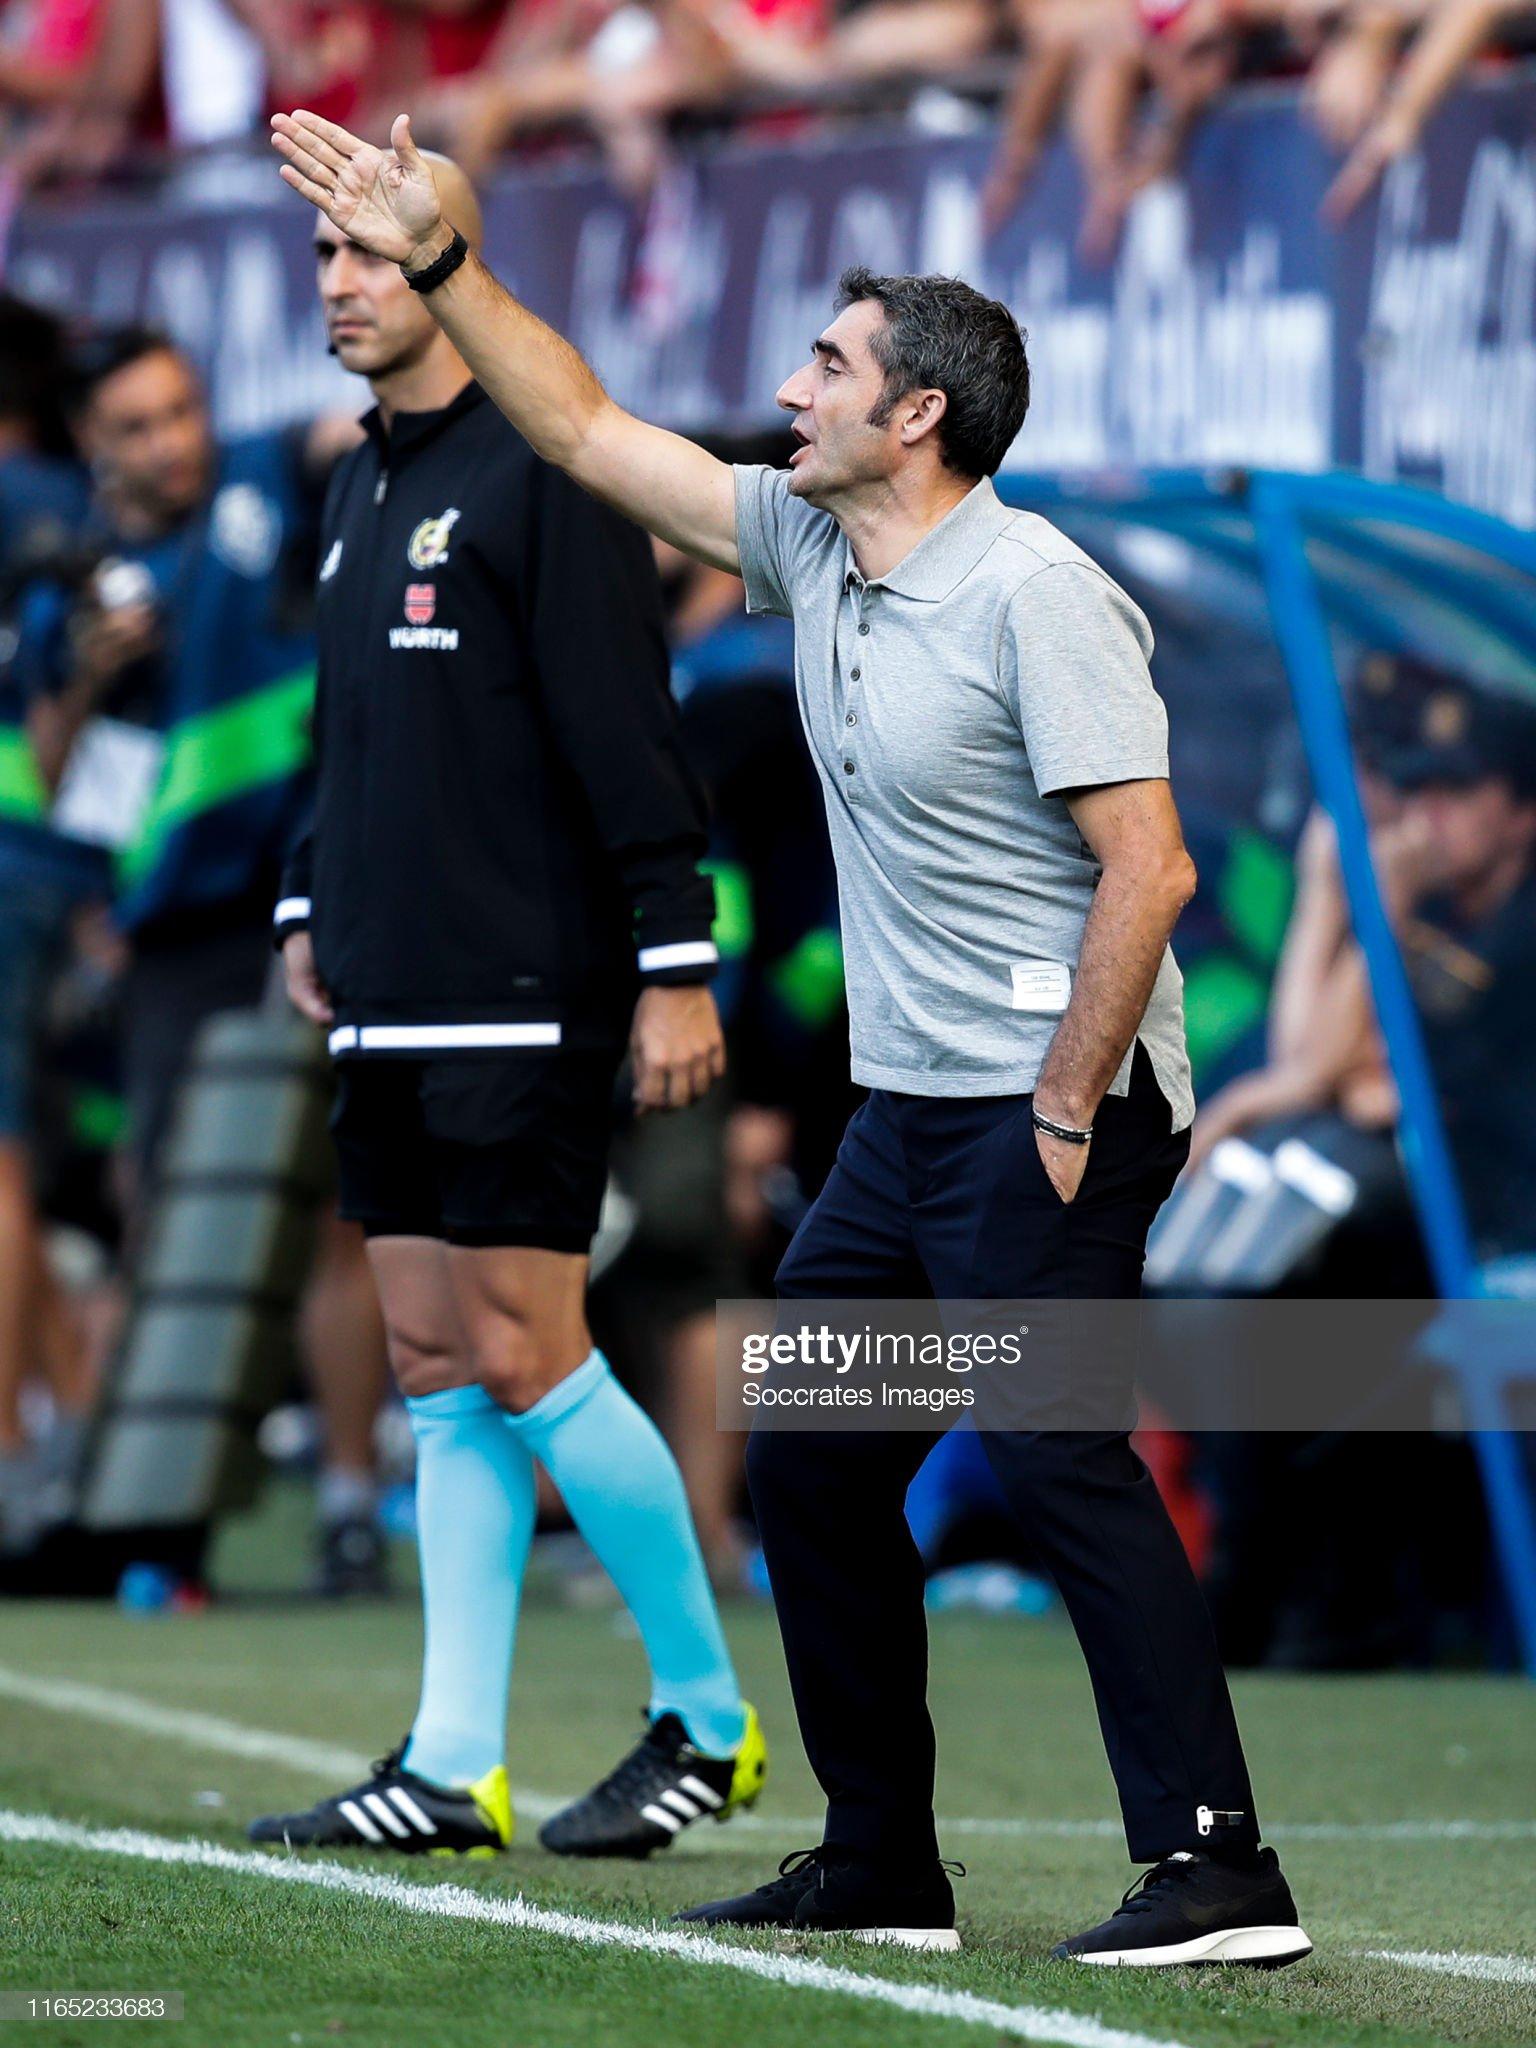 صور مباراة : أوساسونا - برشلونة 2-2 ( 31-08-2019 )  Coach-ernesto-valverde-of-fc-barcelona-during-the-la-liga-santander-picture-id1165233683?s=2048x2048